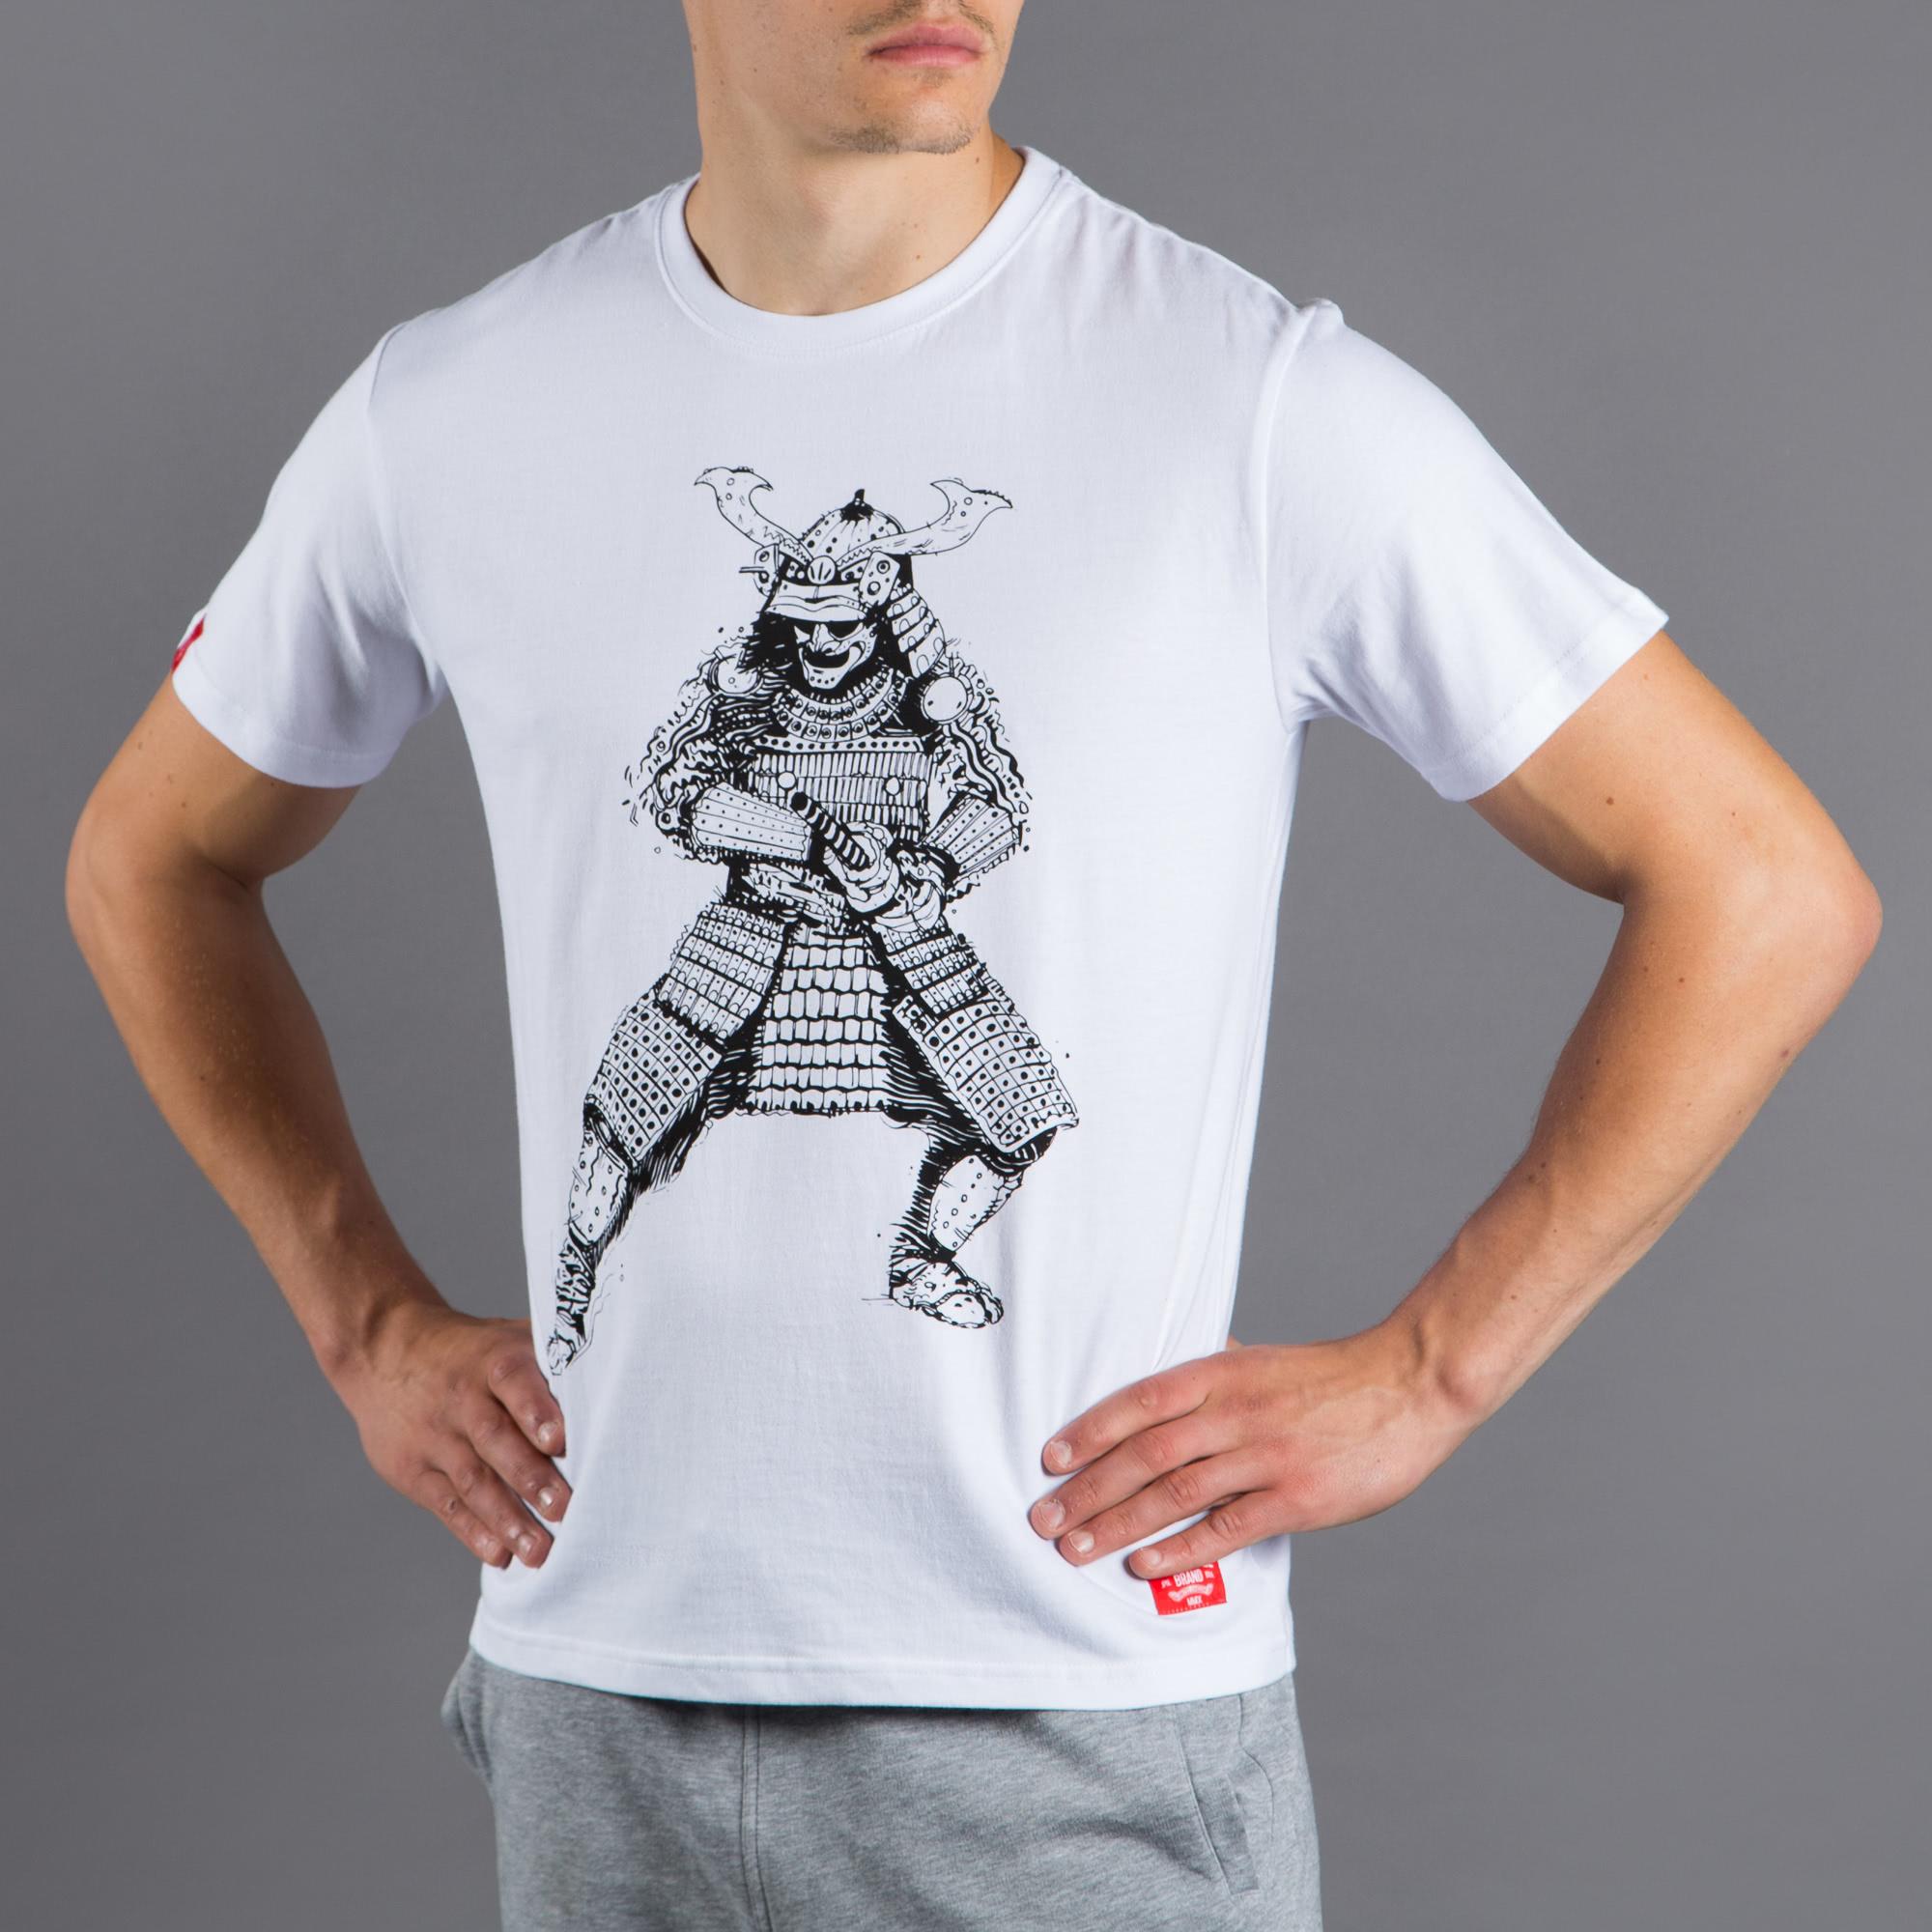 SCRAMBLE SAMURAI T-SHIRT|格闘技 柔術Tシャツ